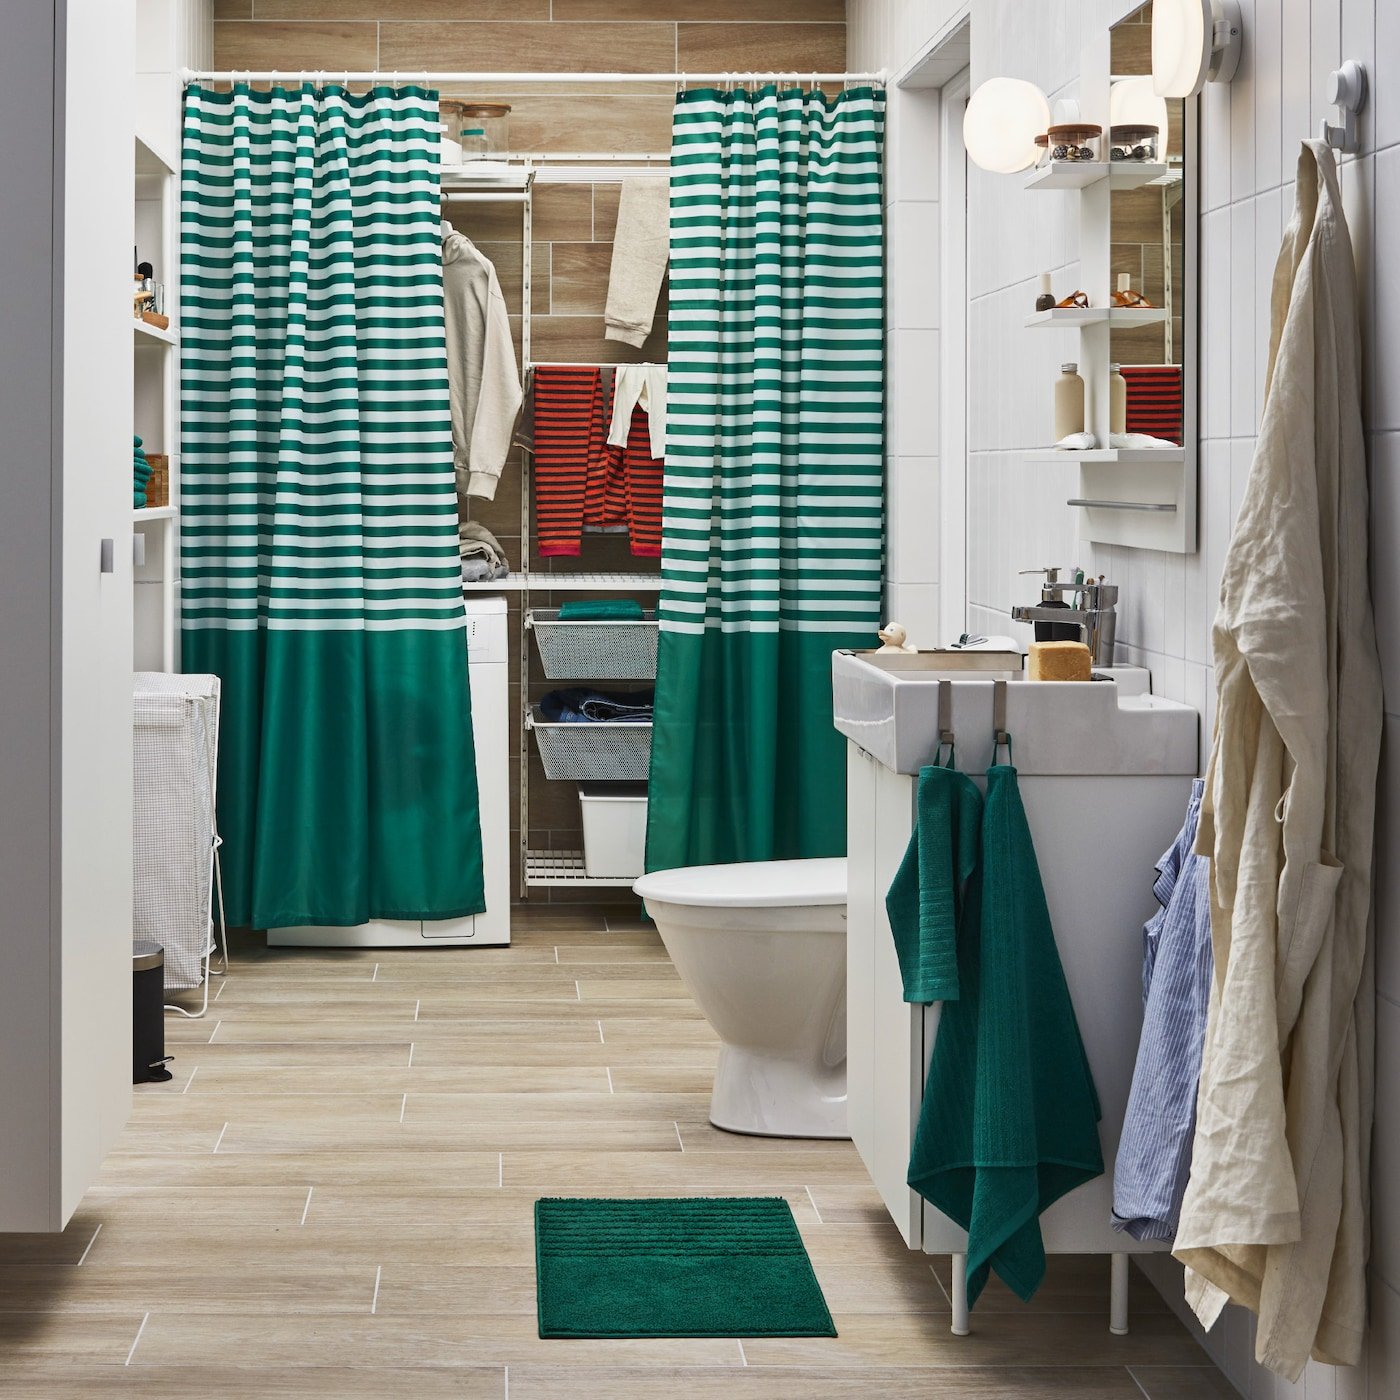 Scala Per Libreria Ikea lasciati ispirare dai nostri bagni - ikea it